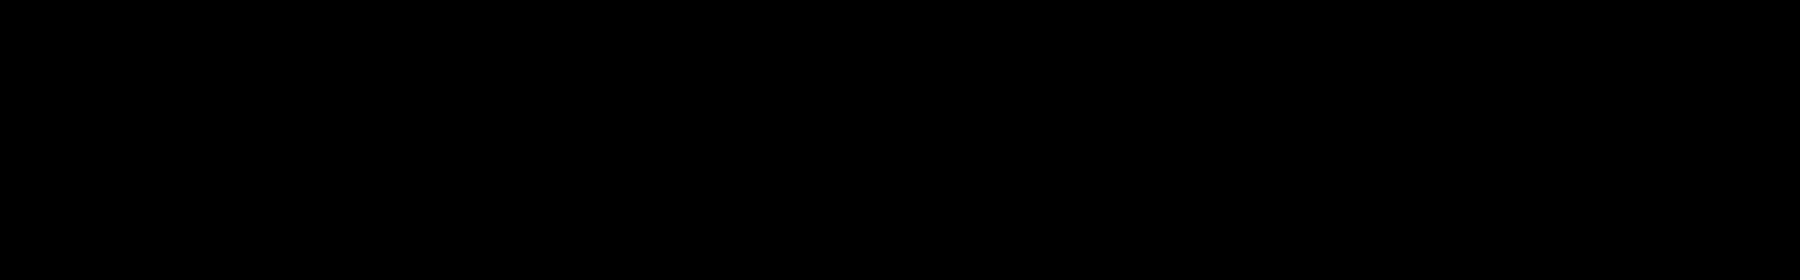 Renegade EDM for Dune 2 audio waveform